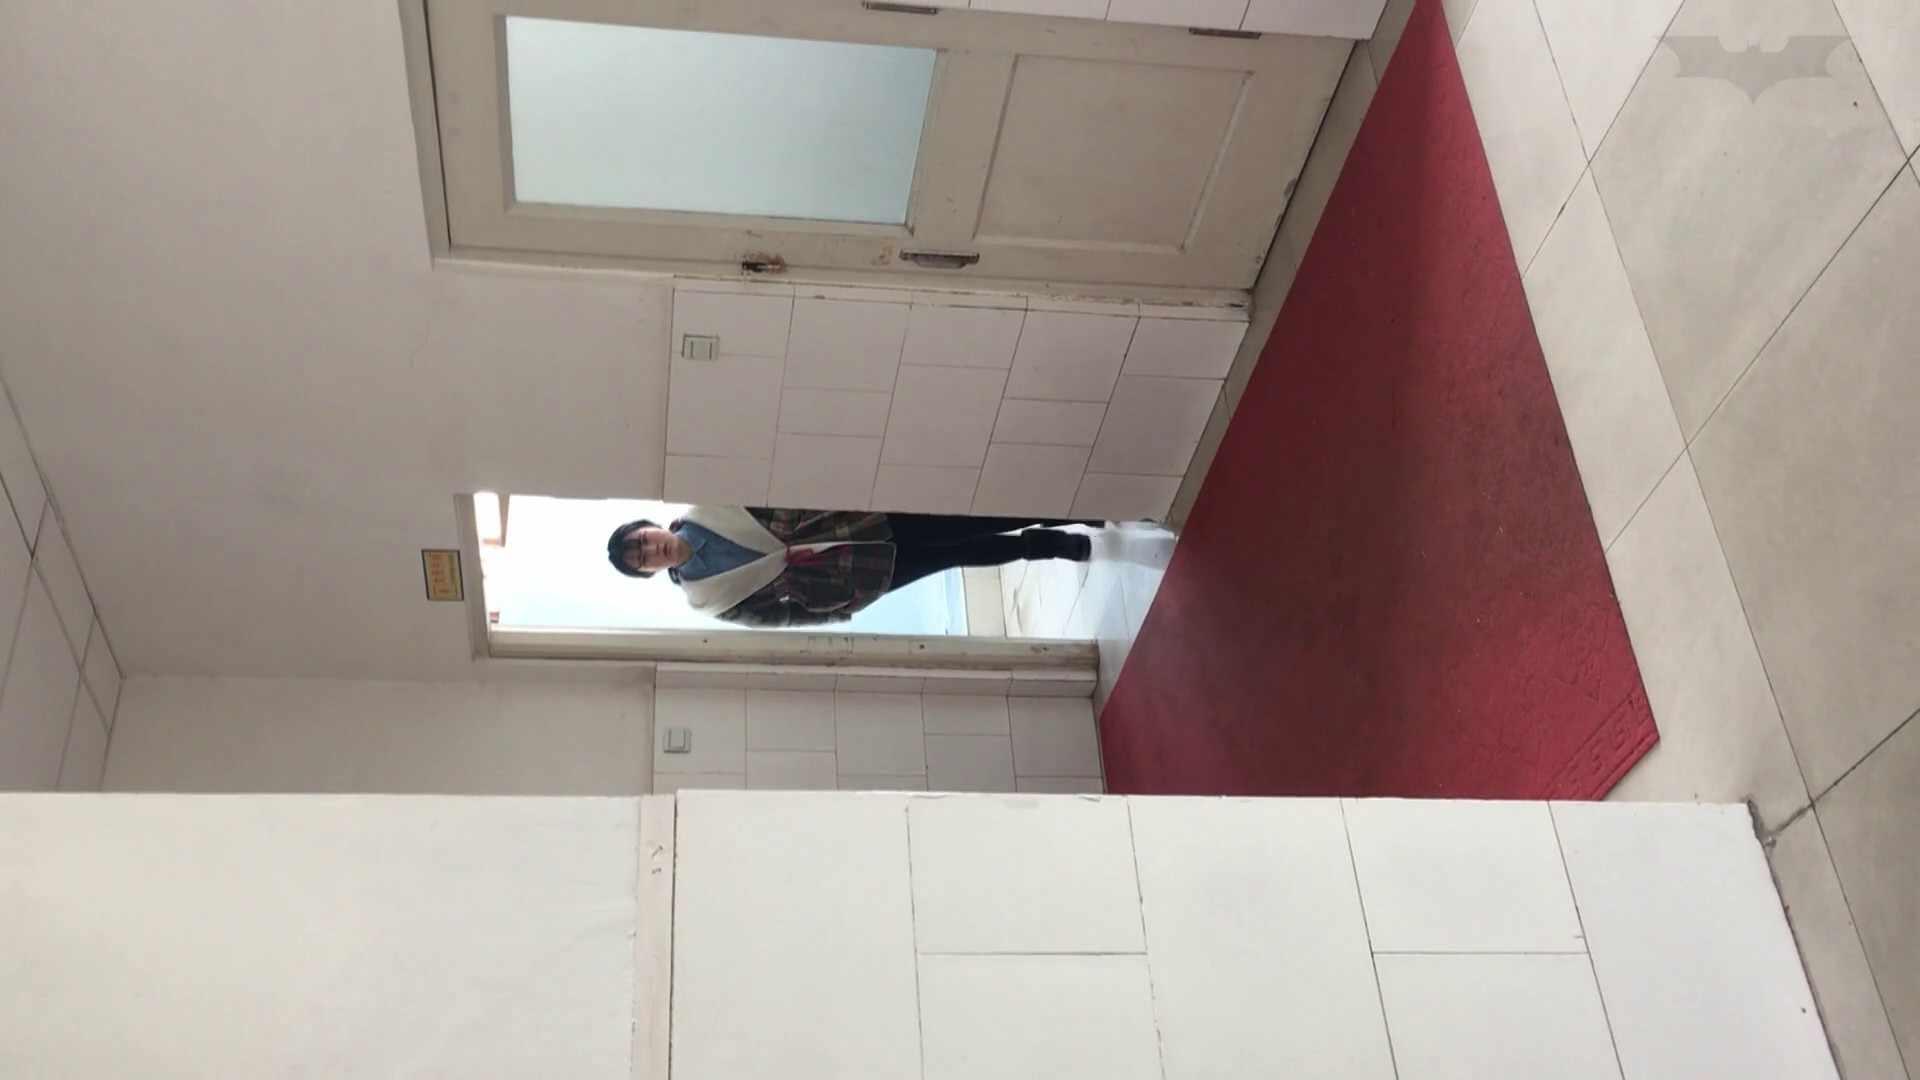 芸術大学ガチ潜入盗撮 JD盗撮 美女の洗面所の秘密 Vol.91 丸見え  85枚 33